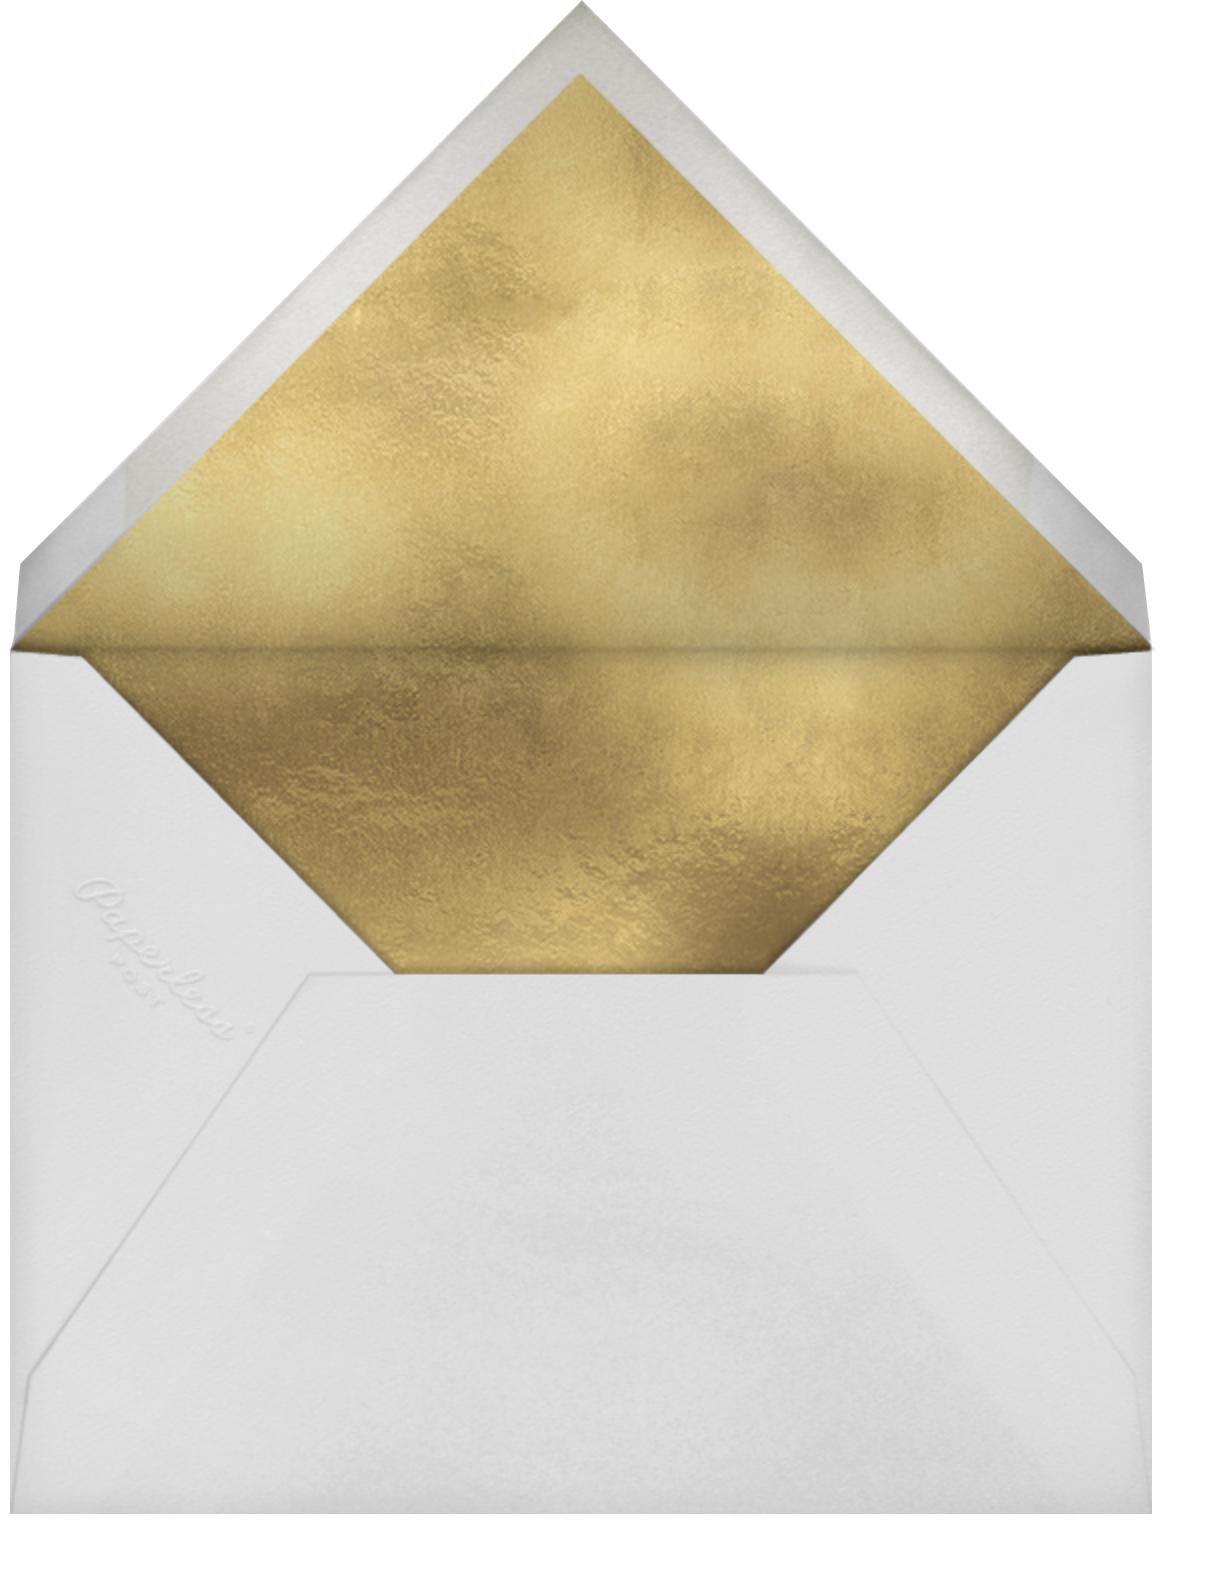 Russian Caravan - Blush - Rifle Paper Co. - Birthday - envelope back